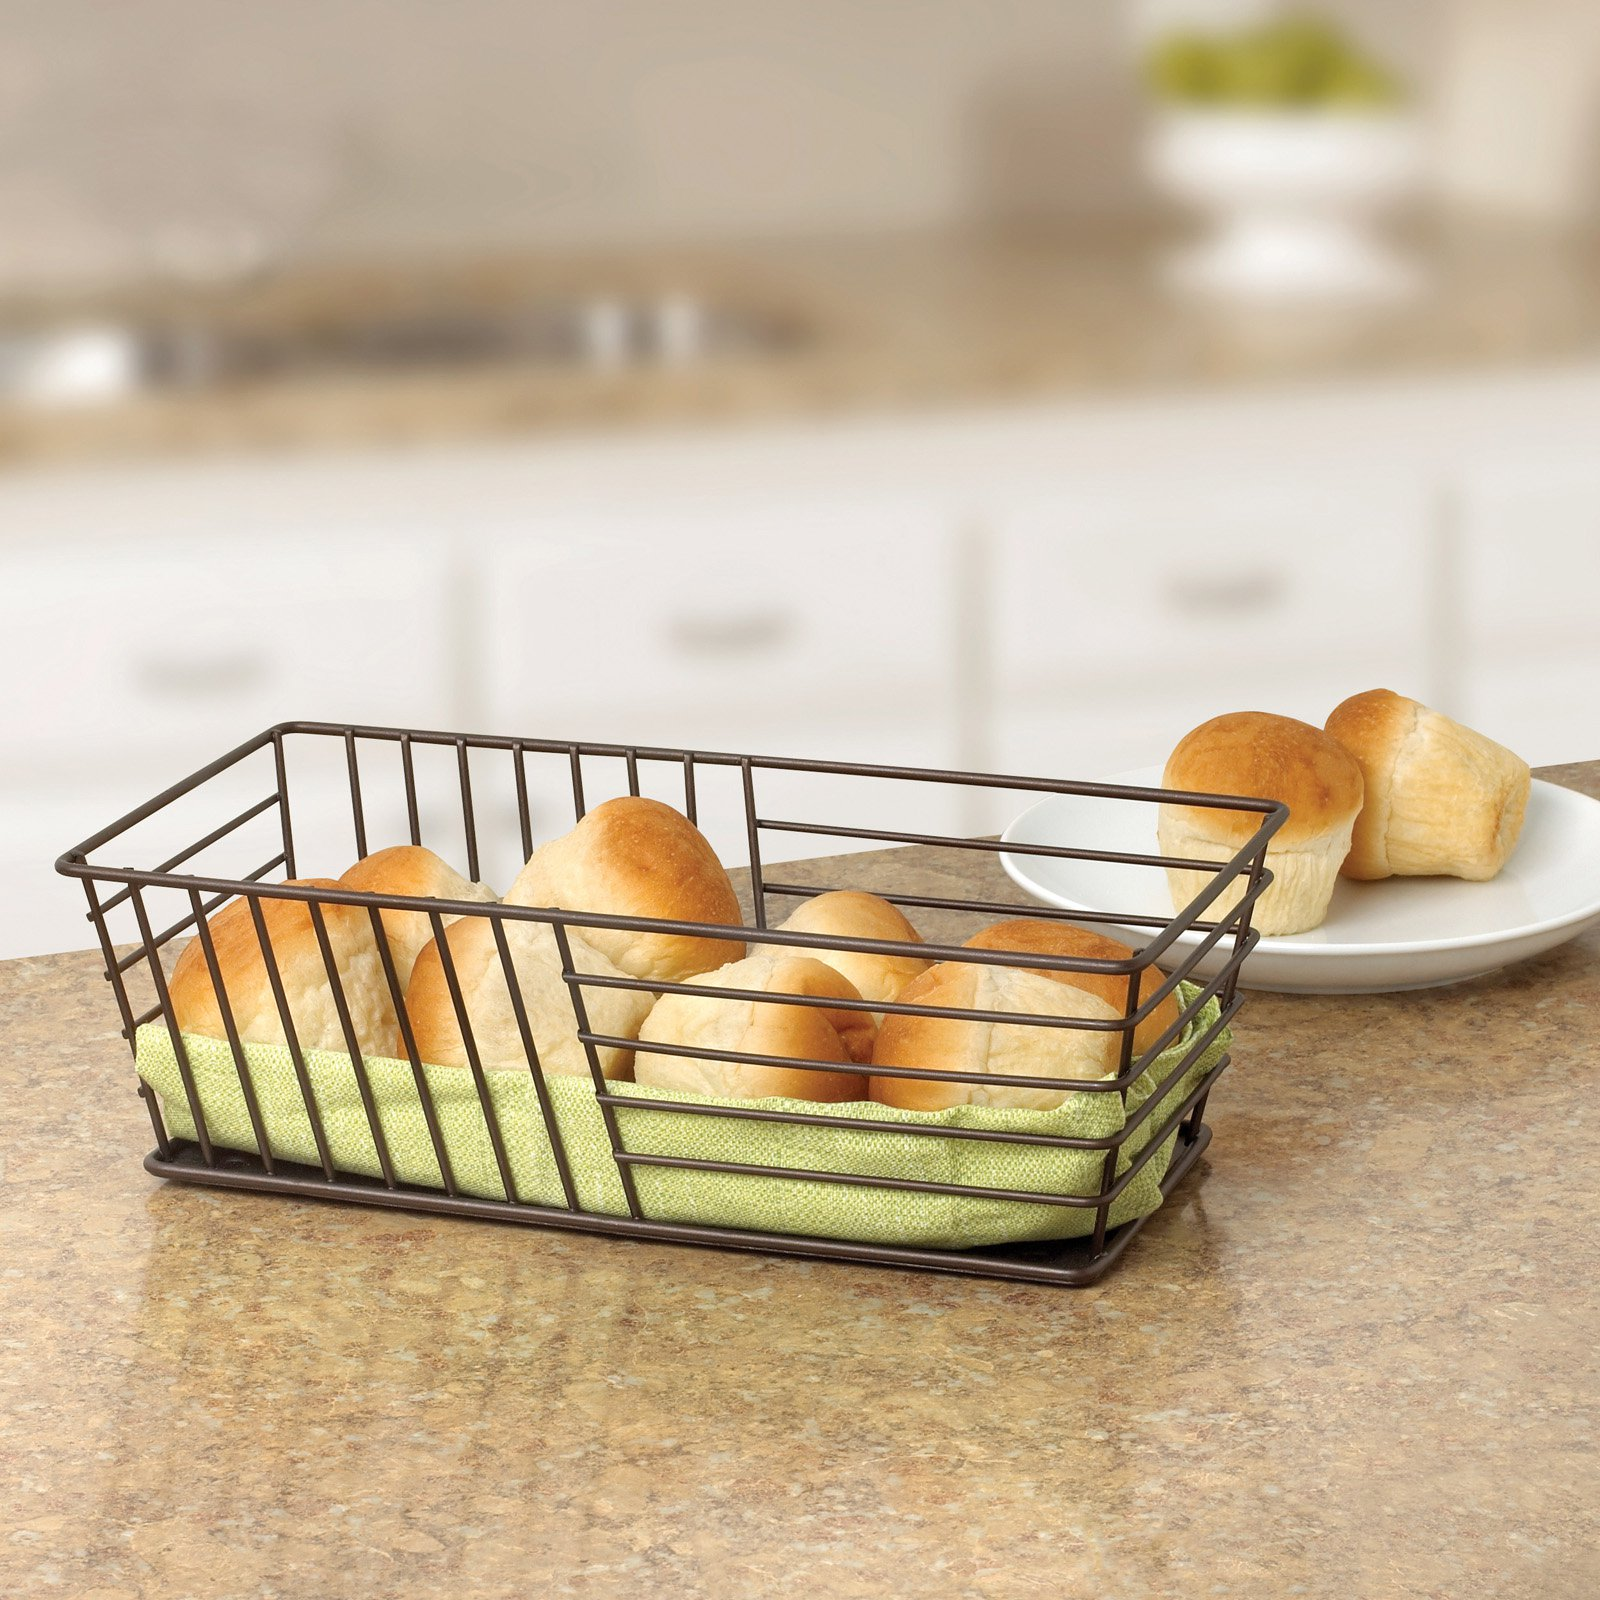 Spectrum Diversified Wright Bread Basket